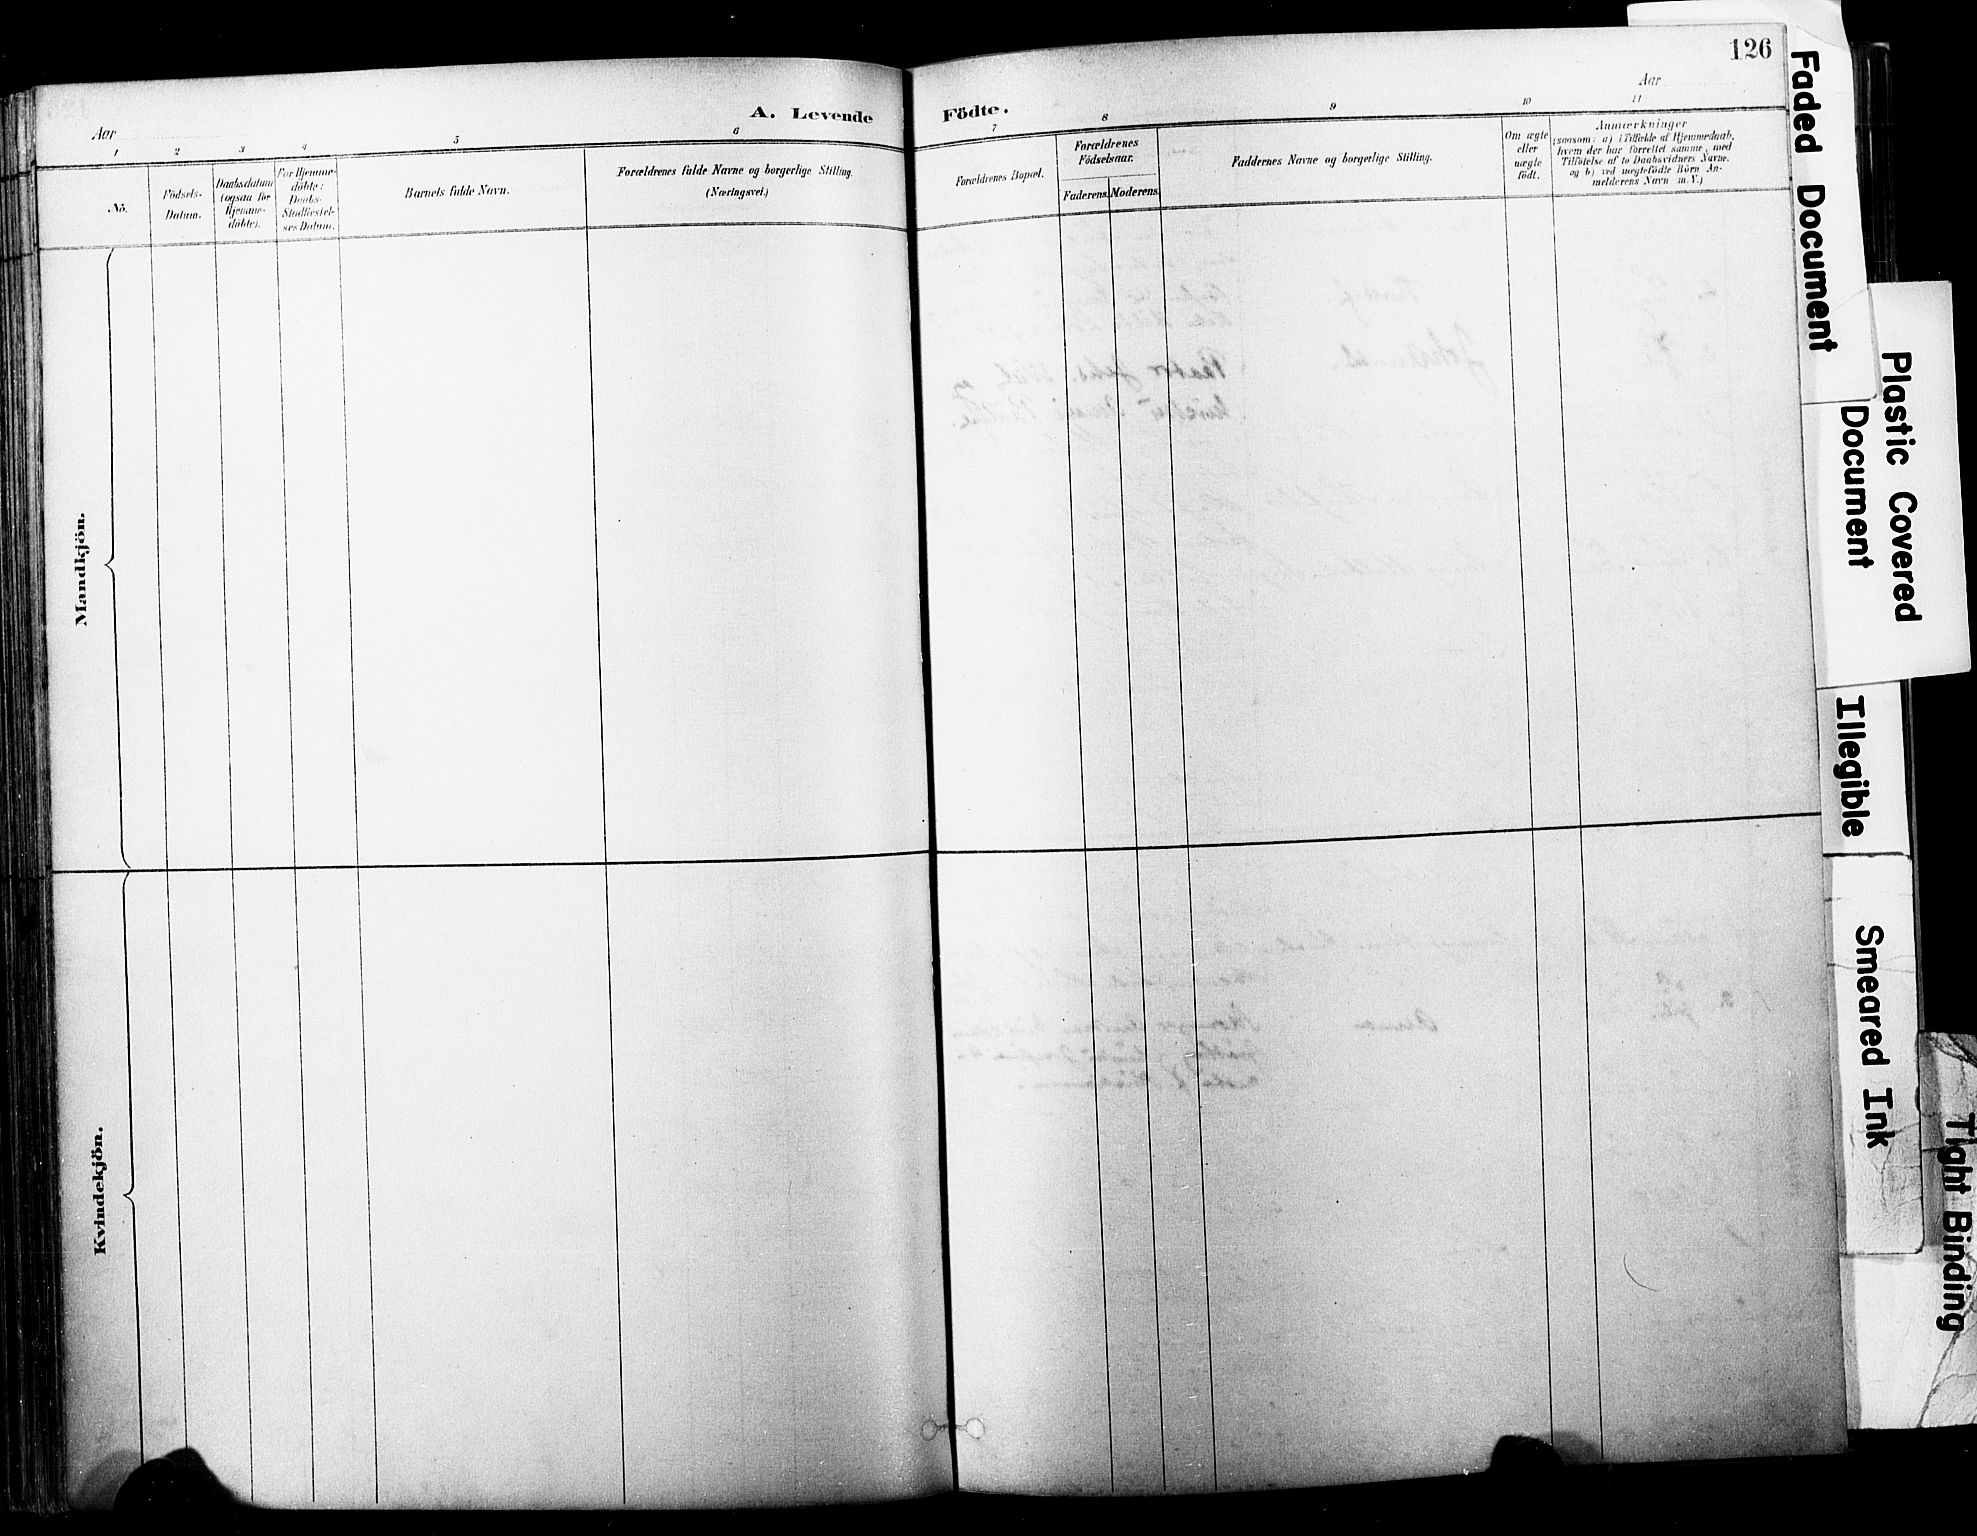 SAKO, Horten kirkebøker, F/Fa/L0004: Parish register (official) no. 4, 1888-1895, p. 126